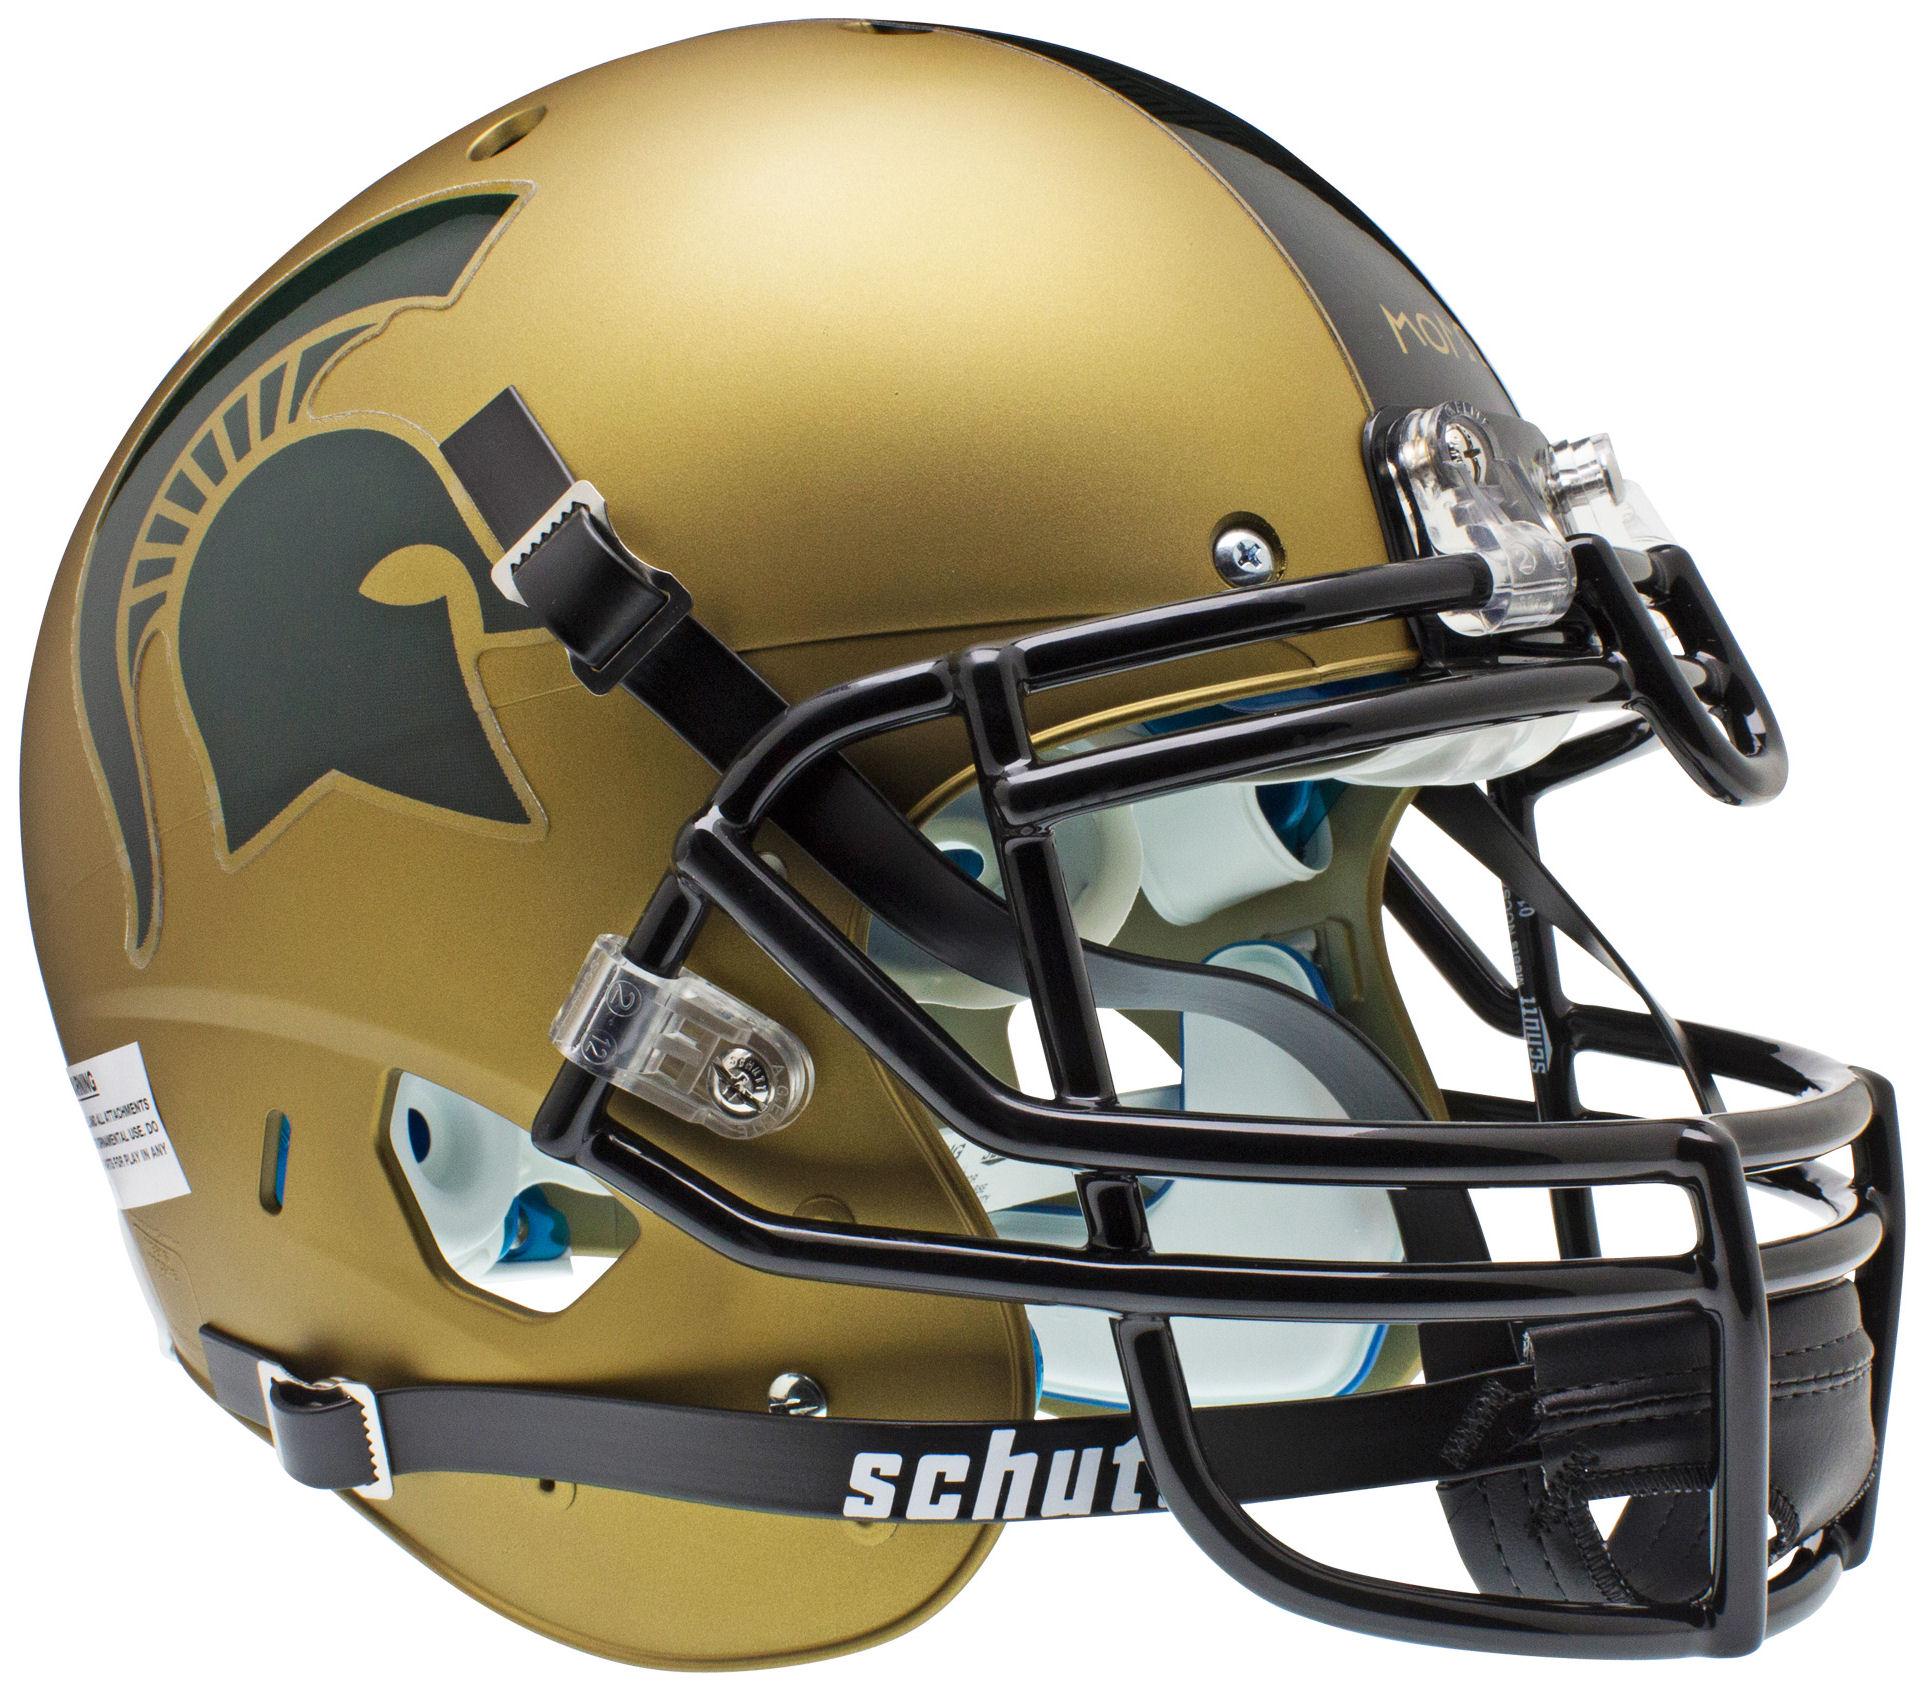 Michigan State Spartans Authentic College XP Football Helmet Schutt <B>Matte Gold</B>